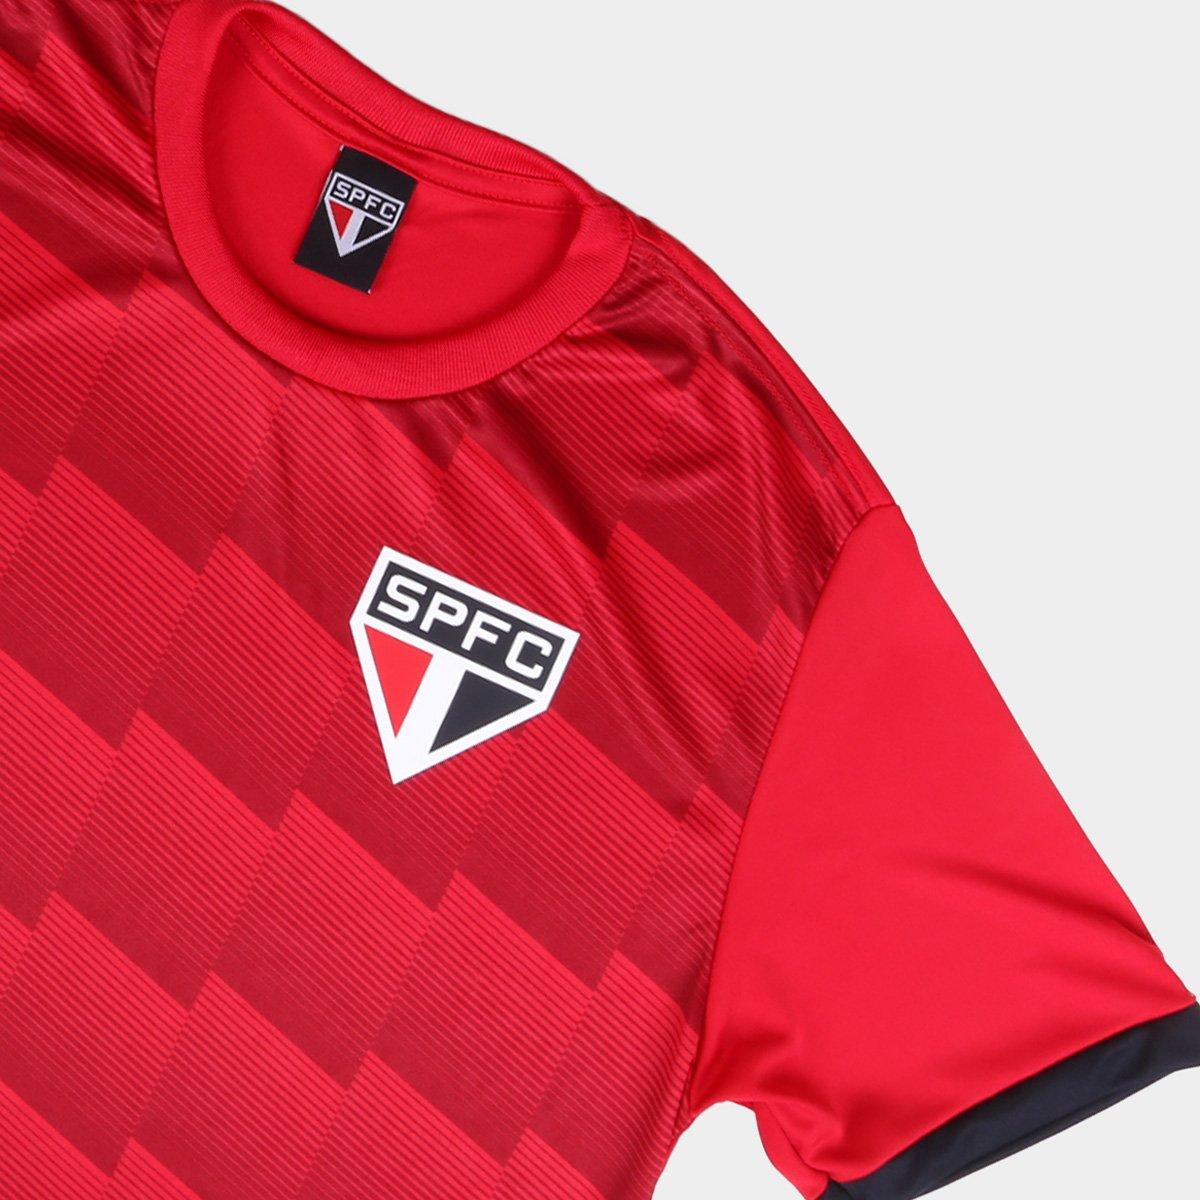 Camisa São Paulo Speed SPR - vermelha